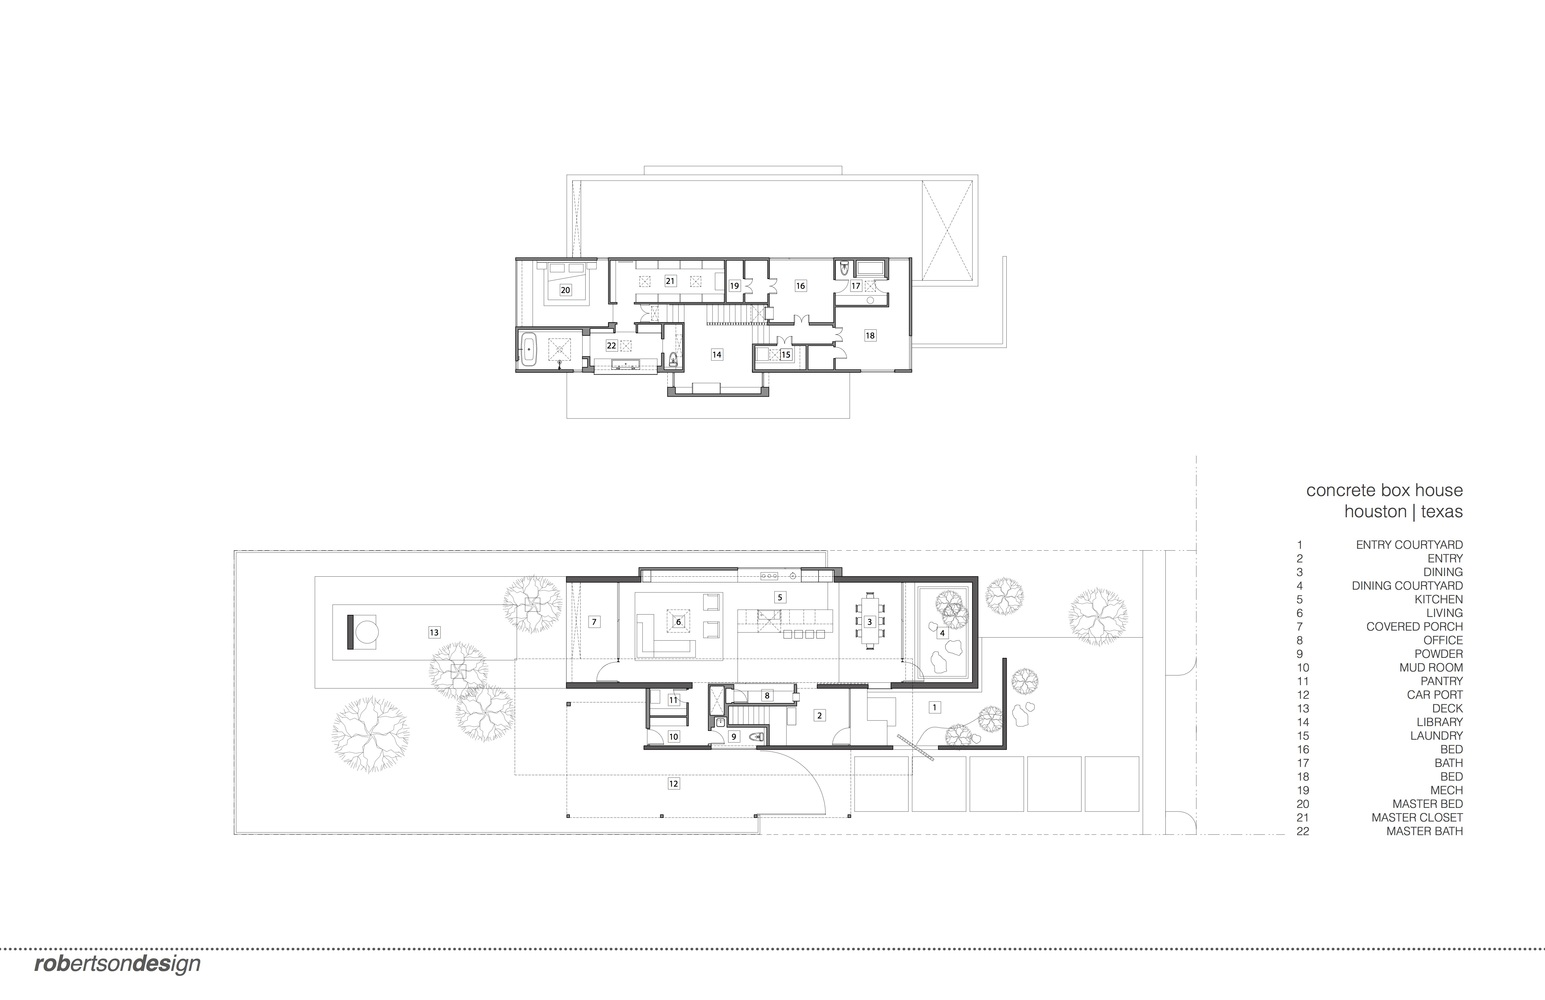 Gallery Of Concrete Box House Robertson Design 32